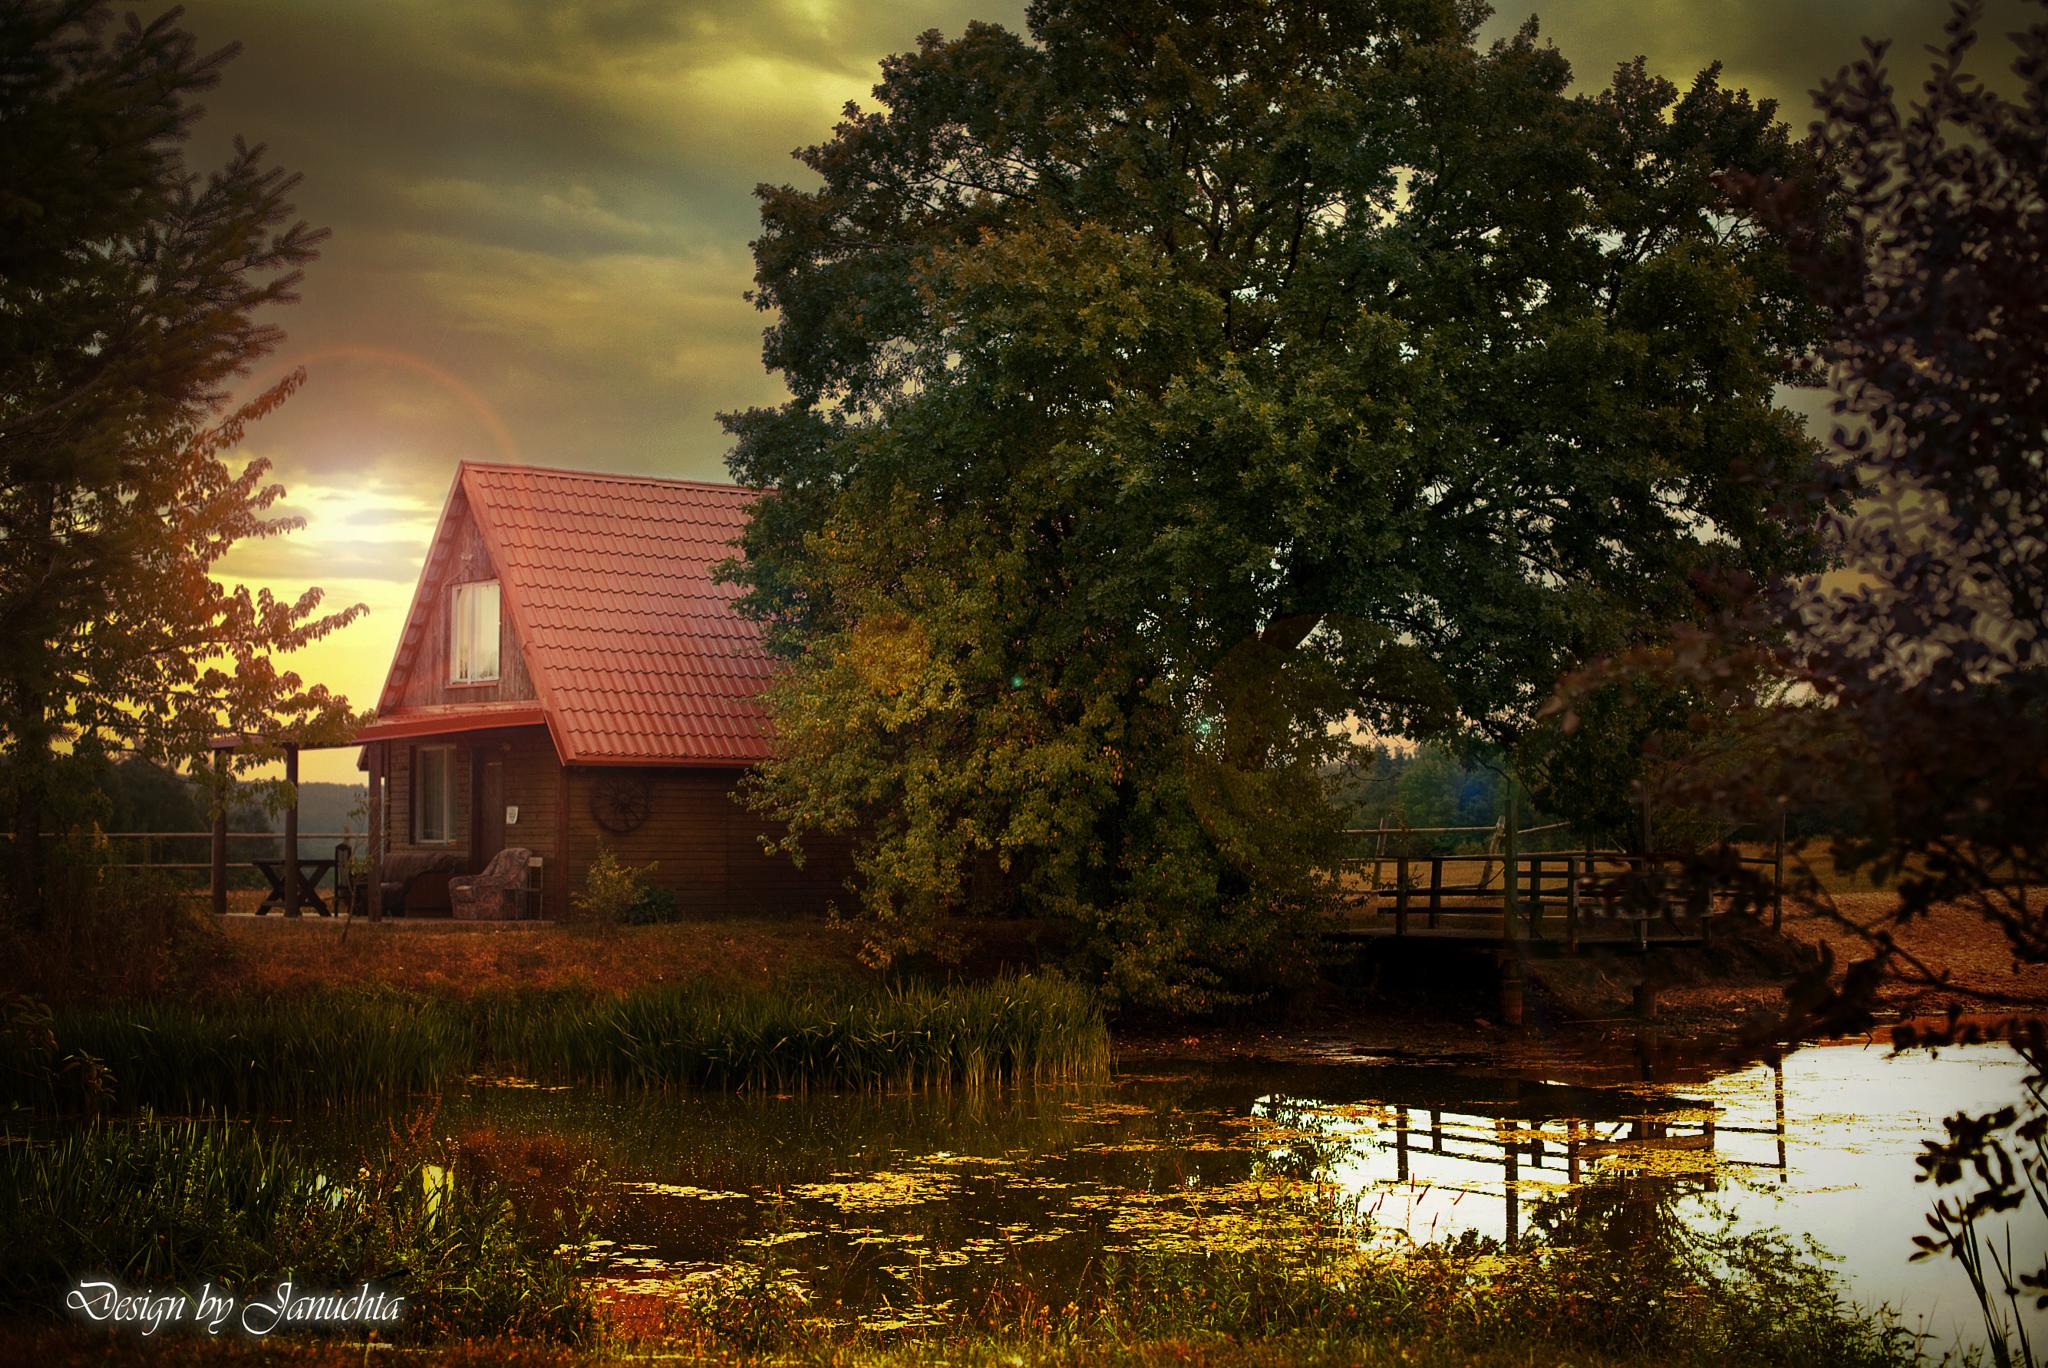 Domek by Januchta